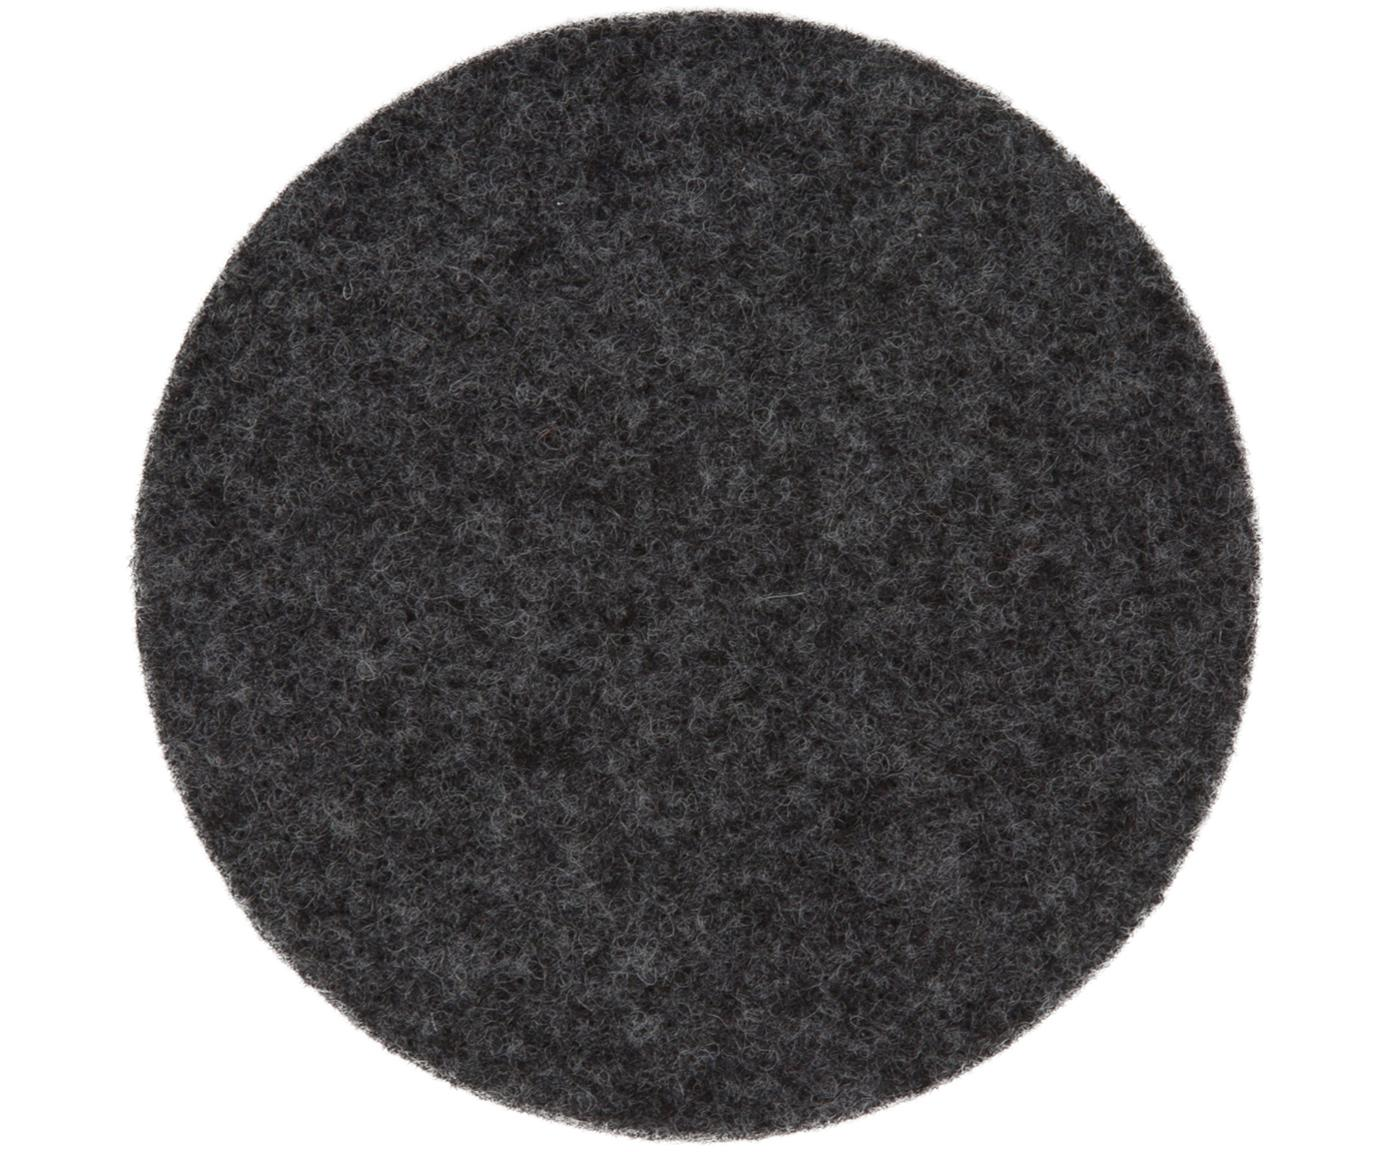 Wollfilz-Untersetzer Leandra, 6 Stück, 90% Wolle, 10% Polyethylen, Anthrazit, Ø 10 cm